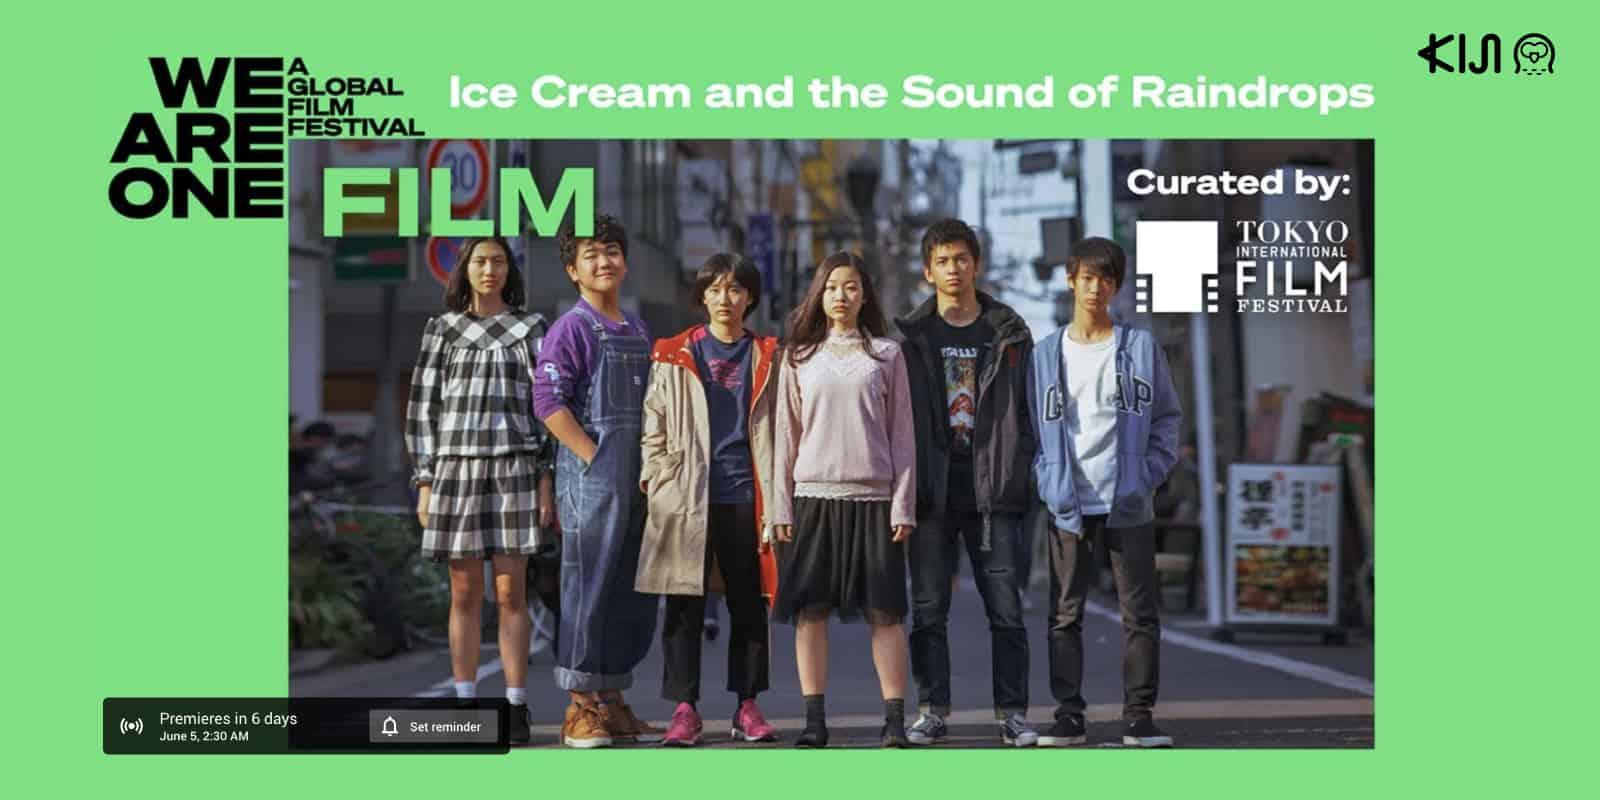 We Are One: A Global Film Festival ชวนชมภาพยนตร์ญี่ปุ่นคัดสรรได้ฟรีทางยูทูปตั้งแต่วันนี้ถึง 7 มิถุนายน